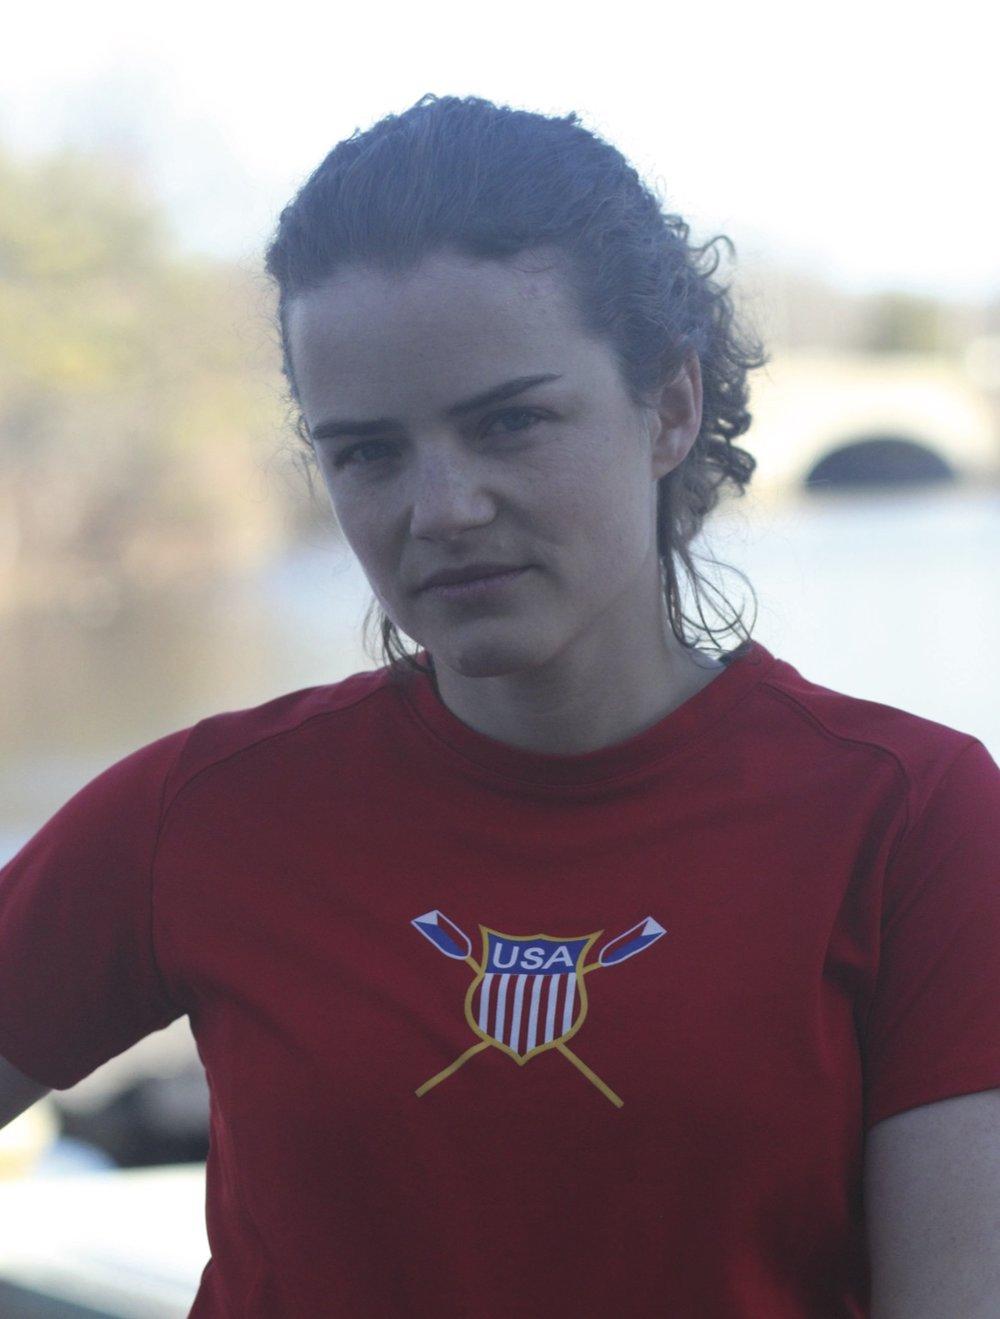 Jenny Sichel, the US National Team LTAMix4+/PR3 Coxswain